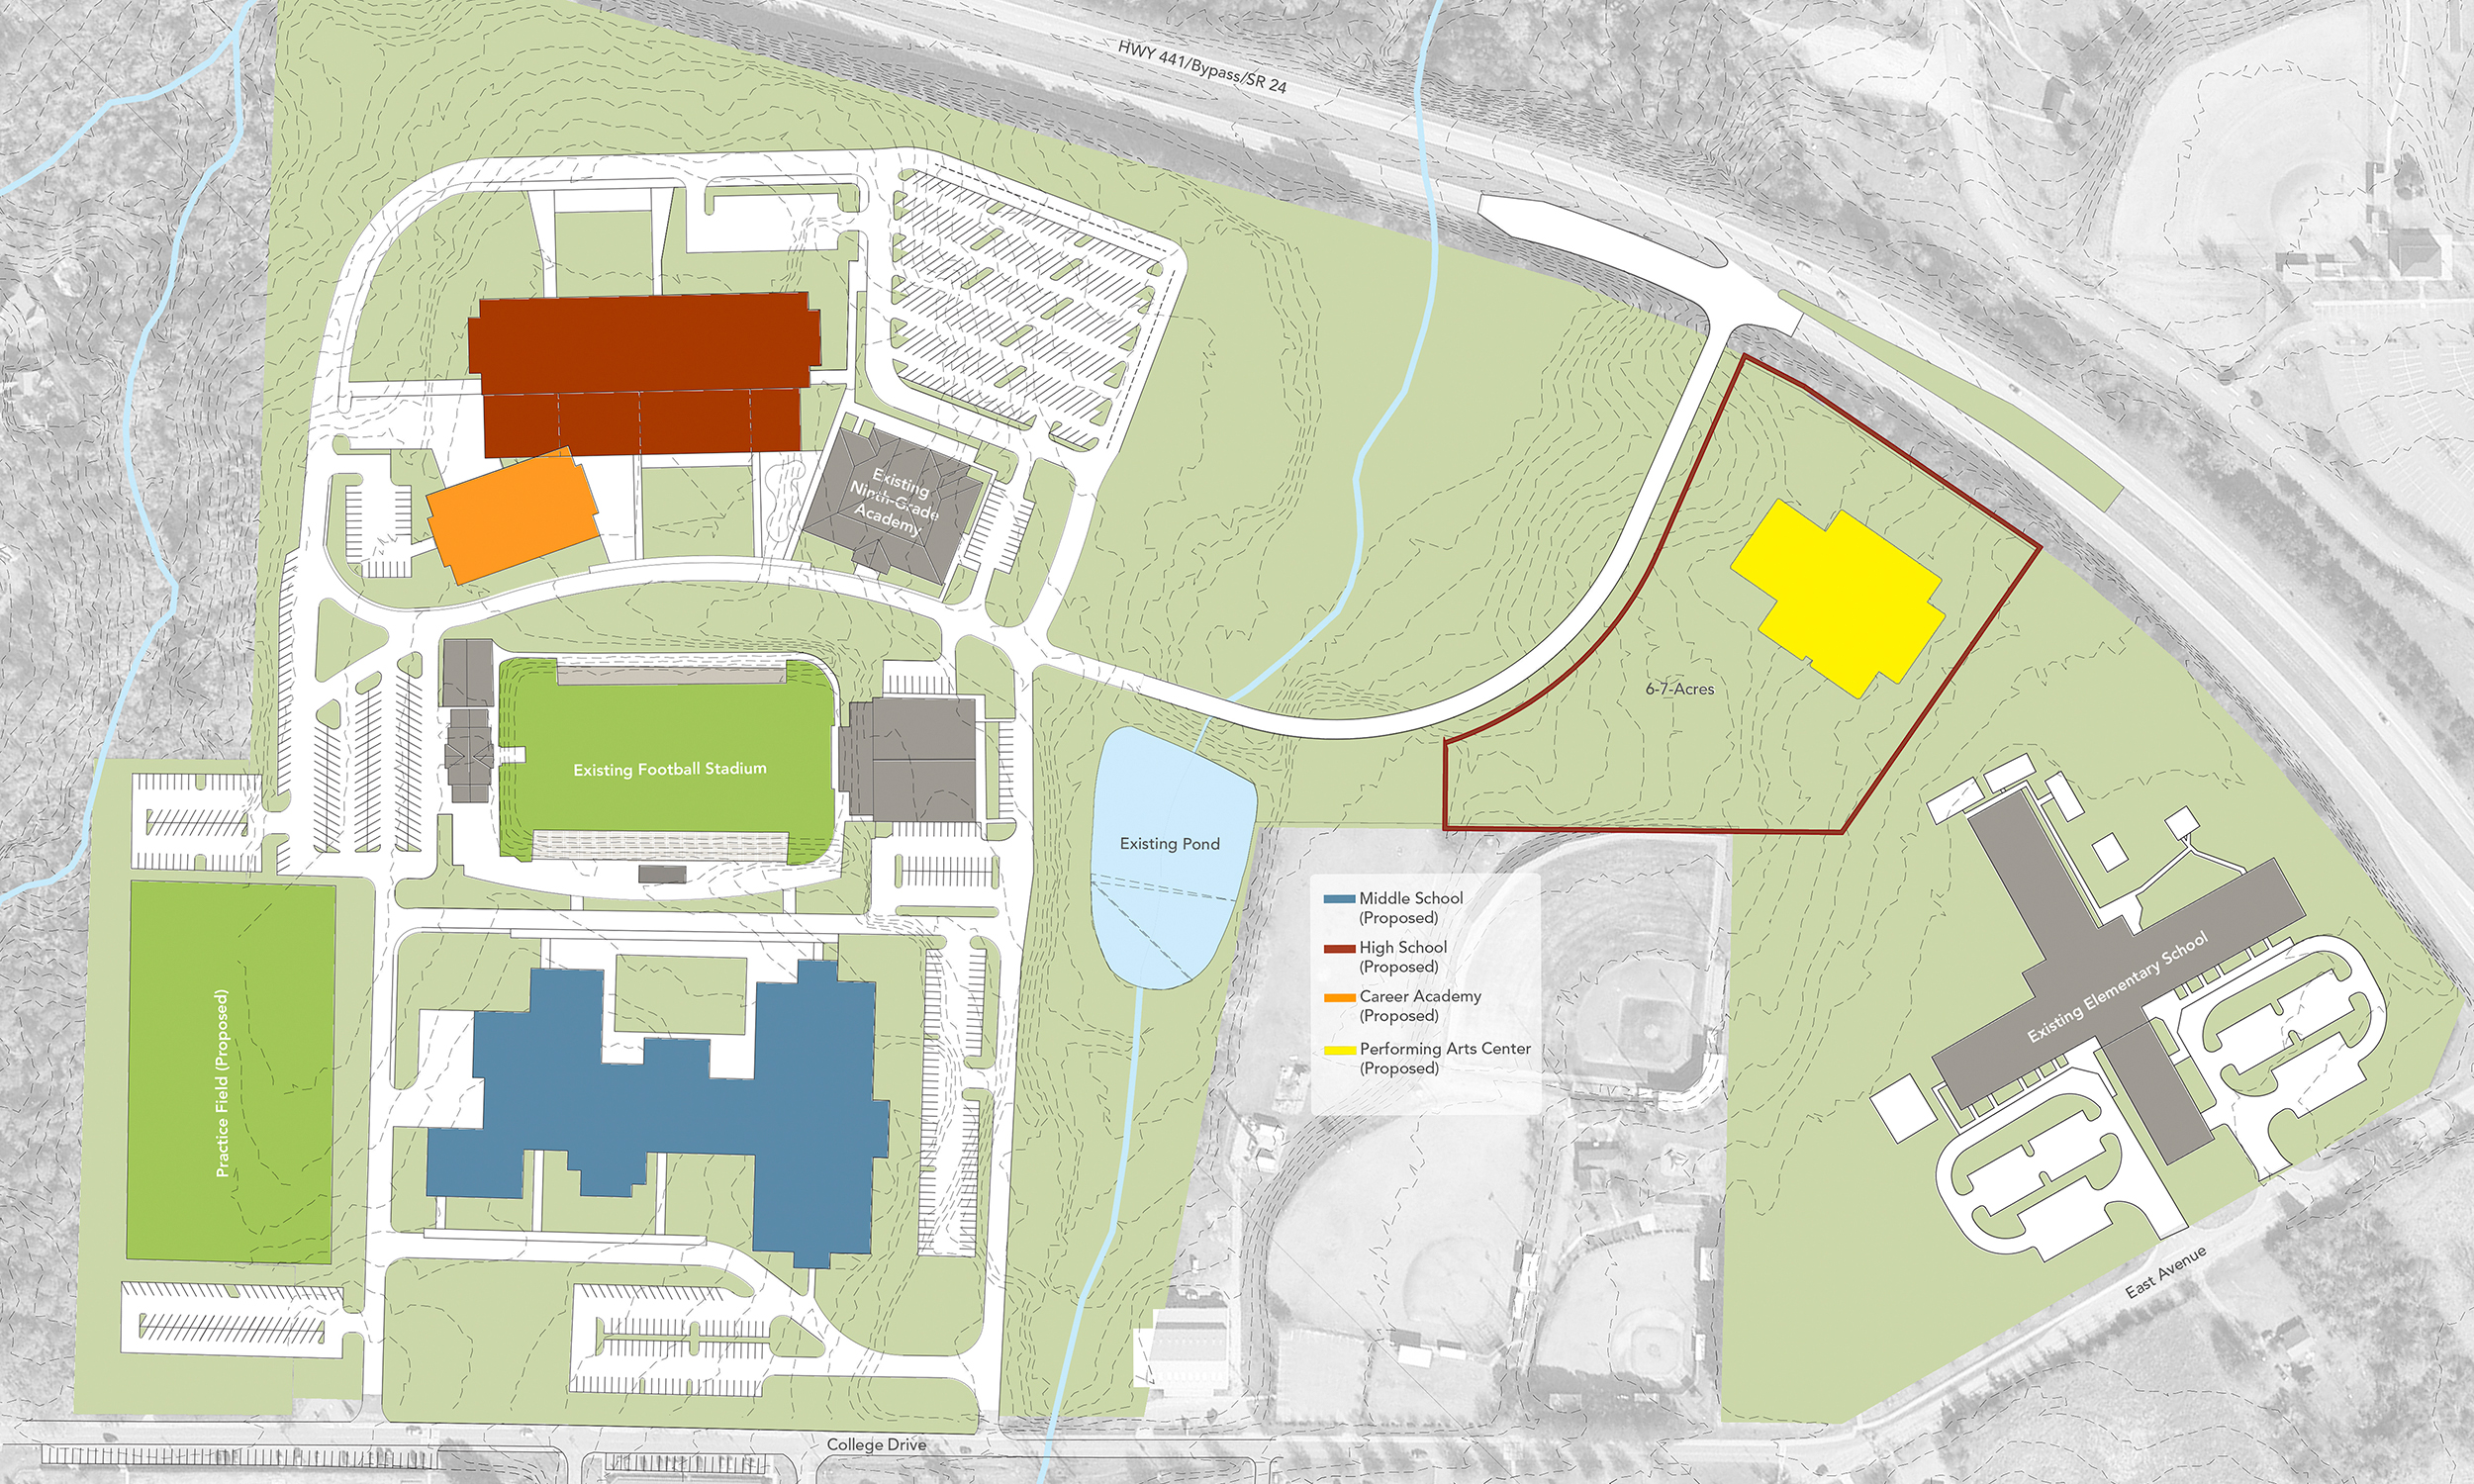 MCCSS Facilities Master Plan